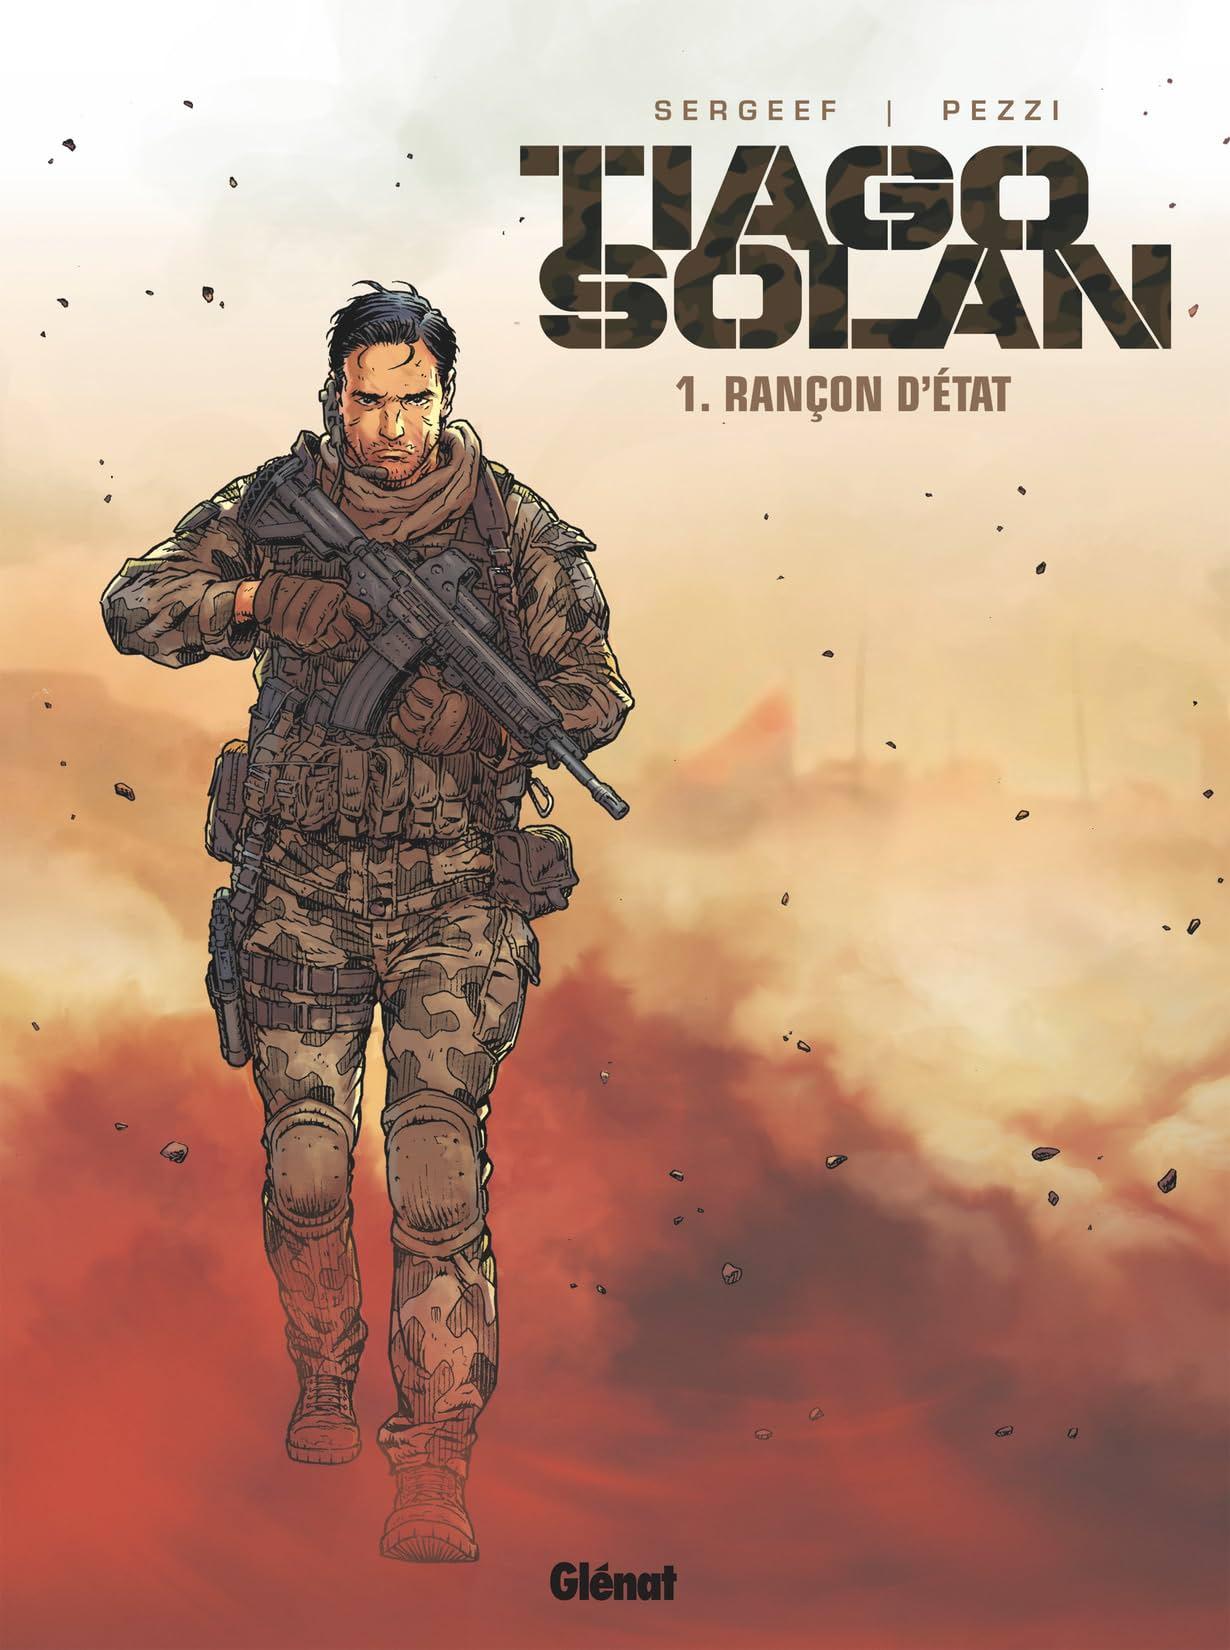 Tiago Solan Vol. 1: Rançon d'État